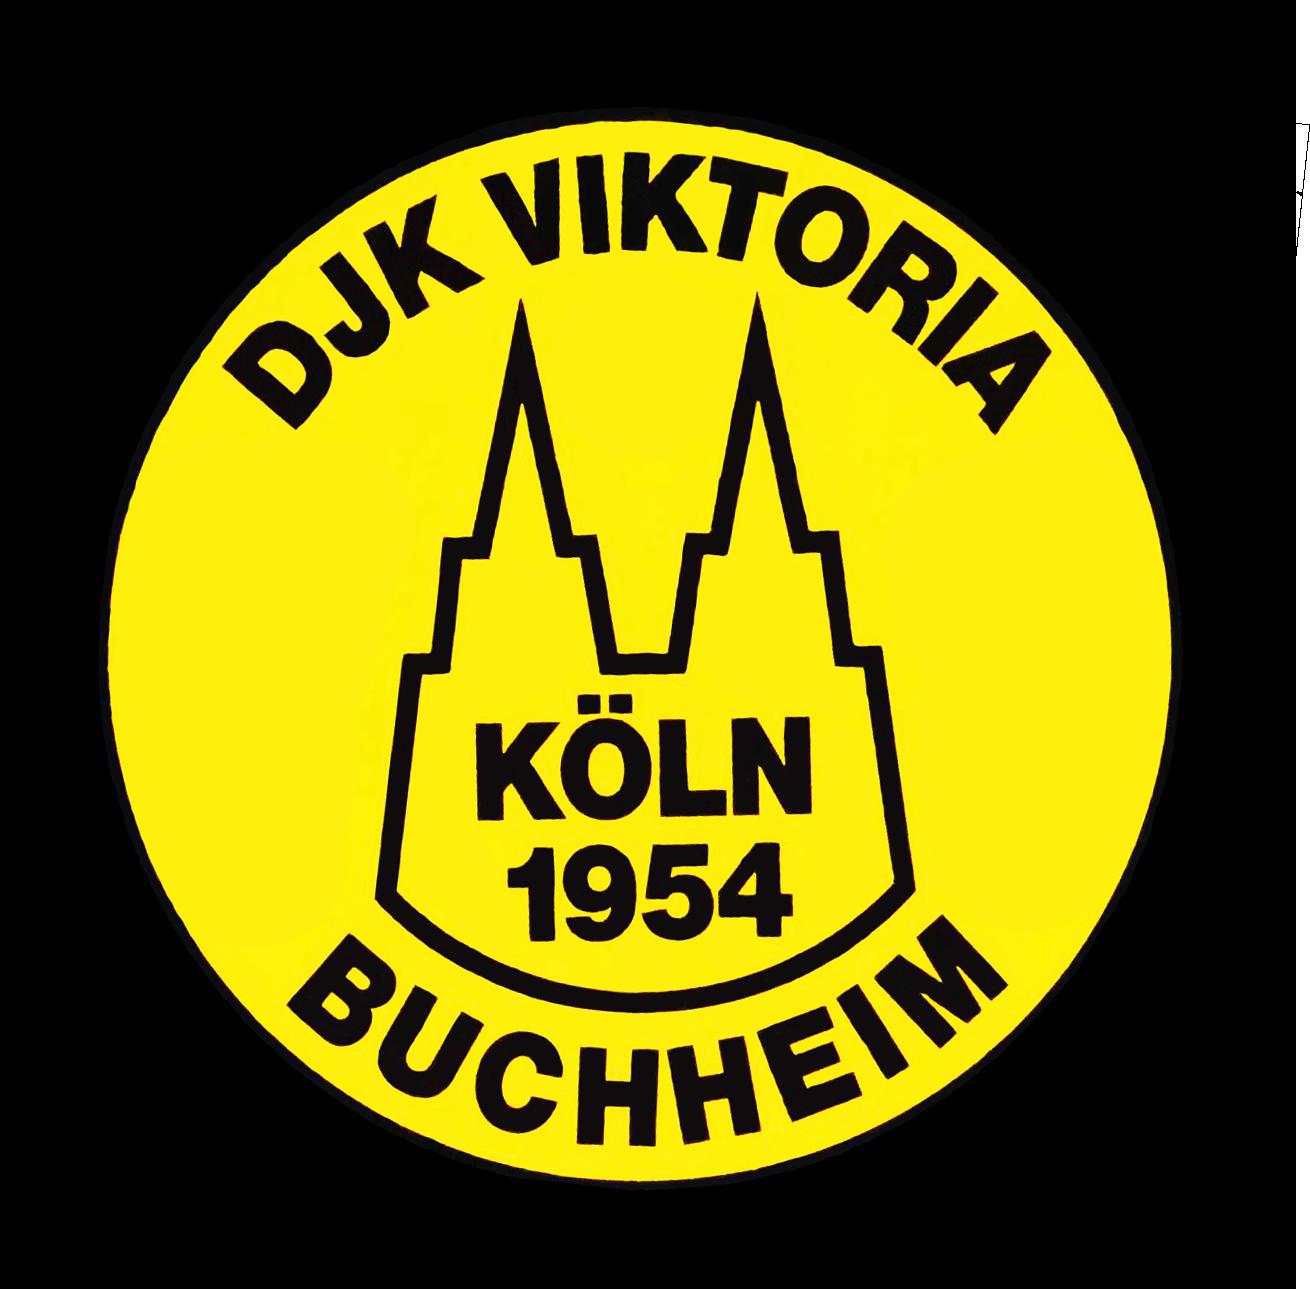 djk-viktoria-buchheim.com